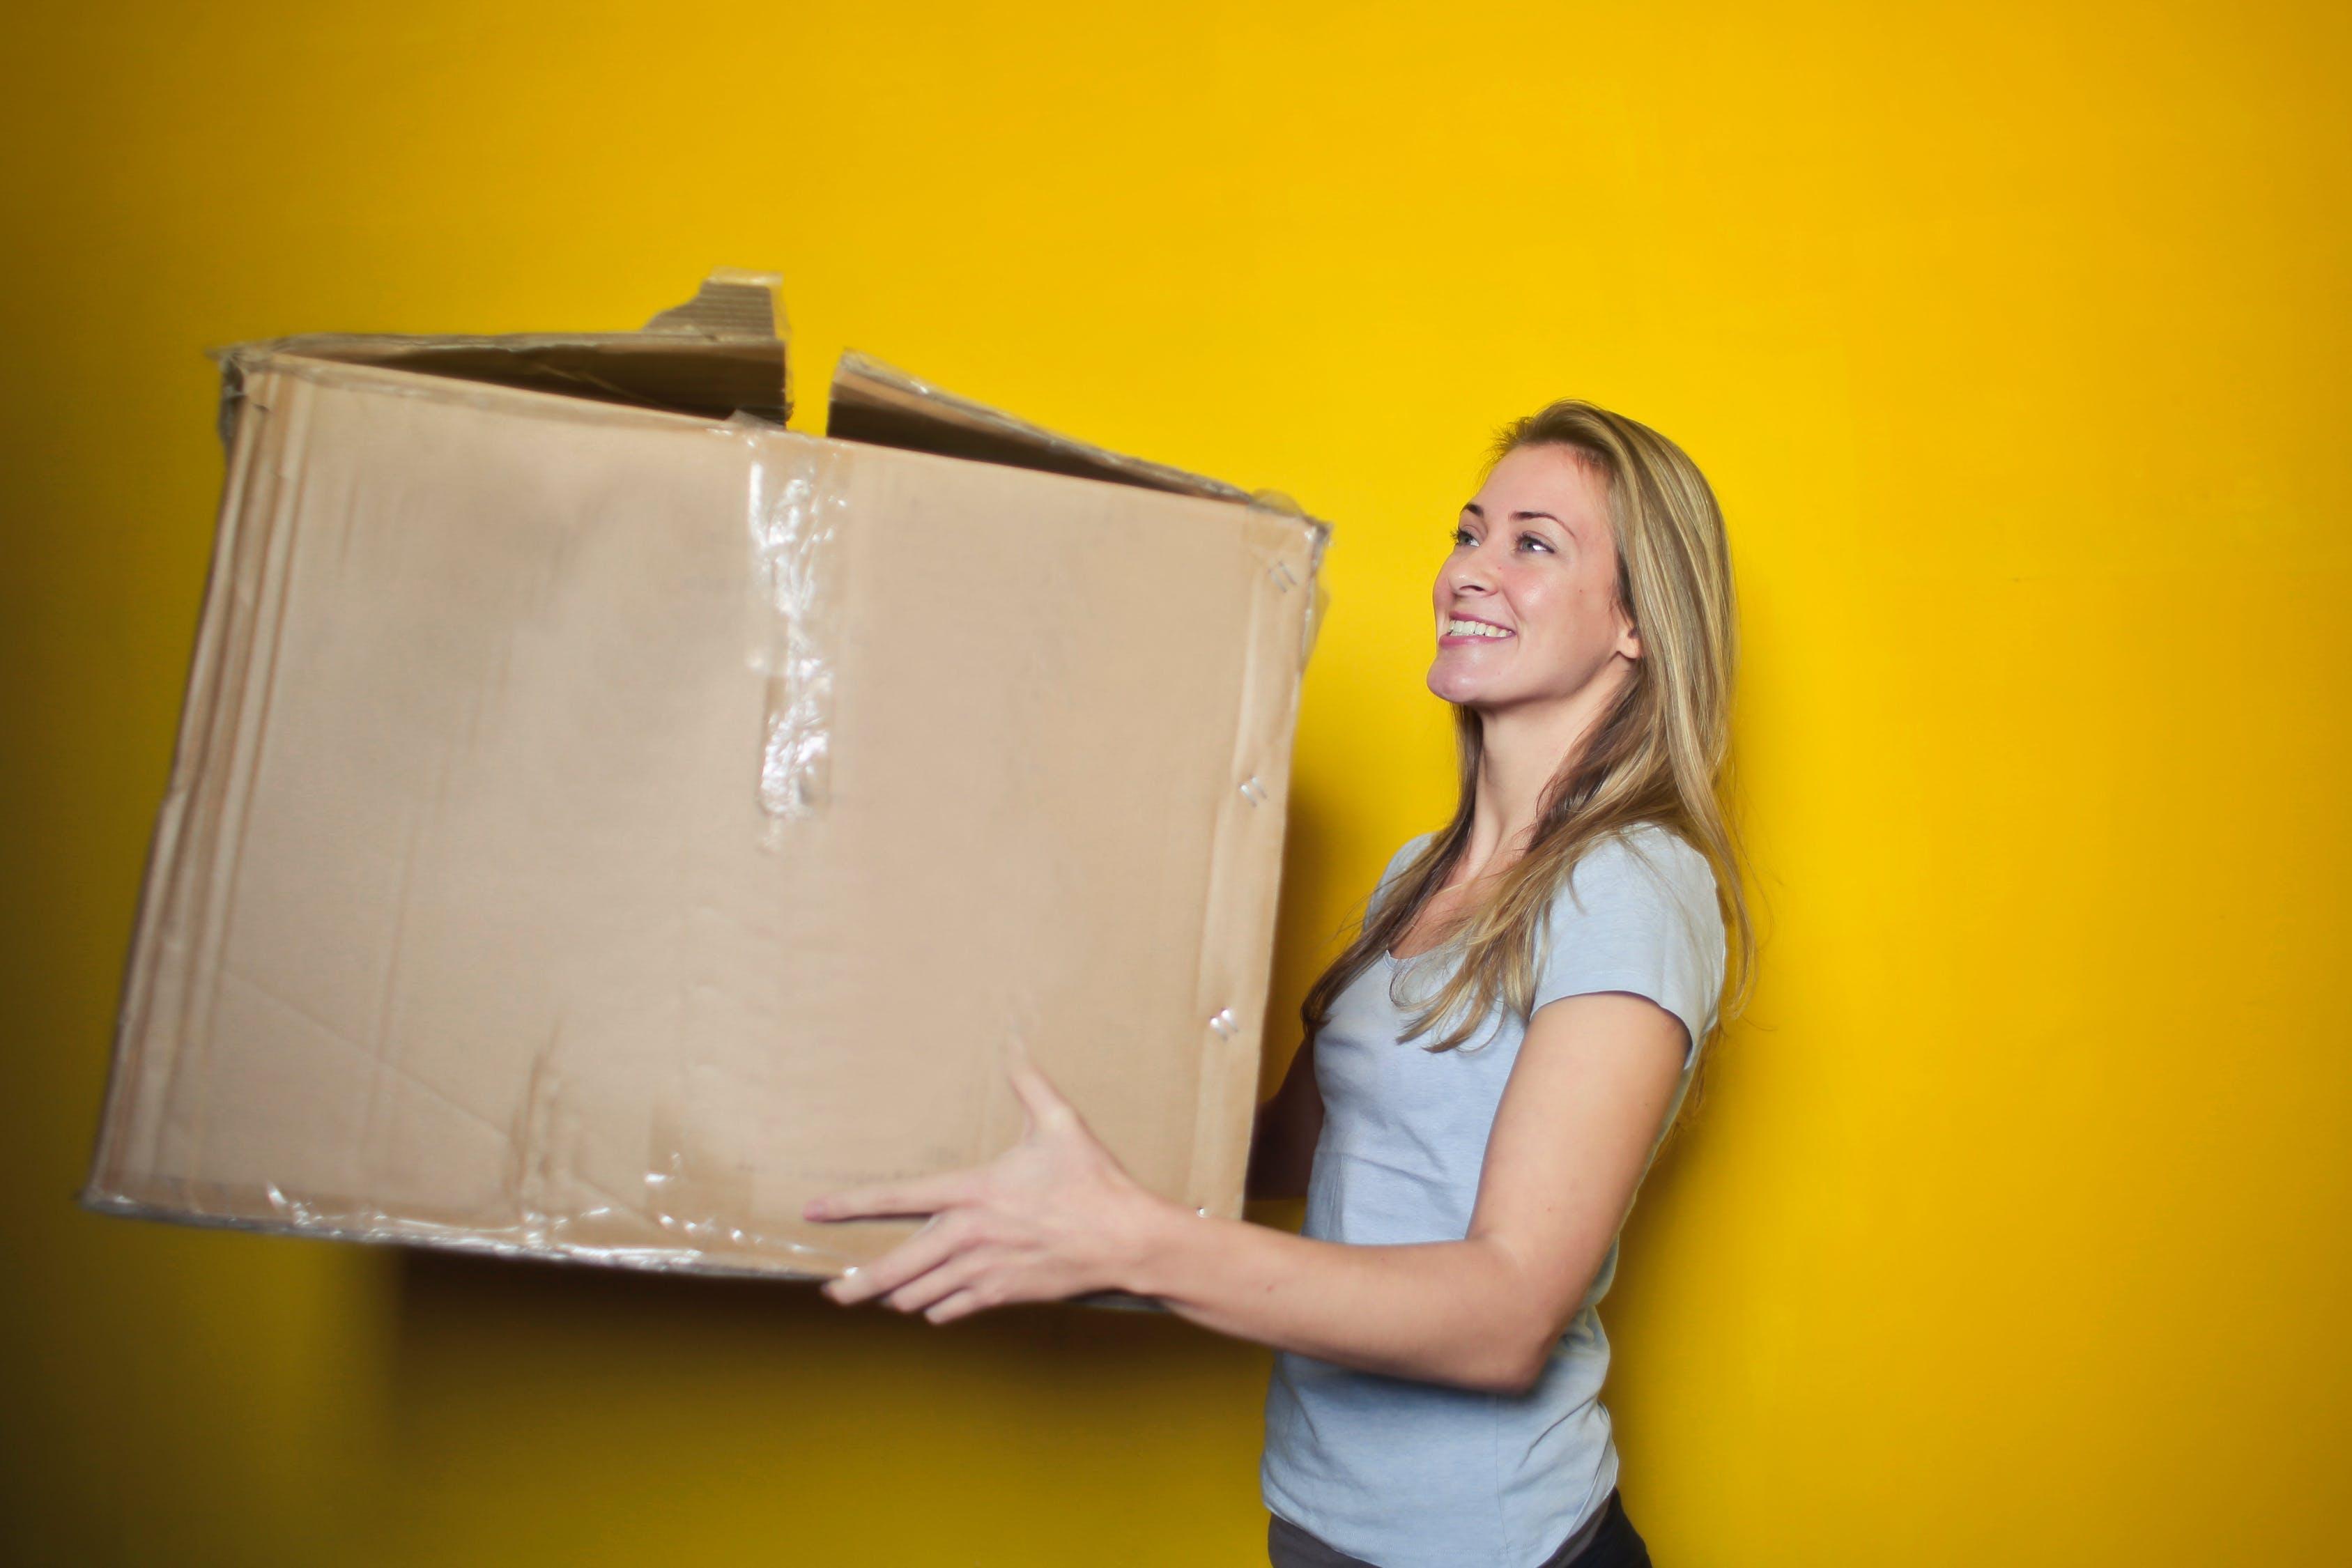 girl holding box